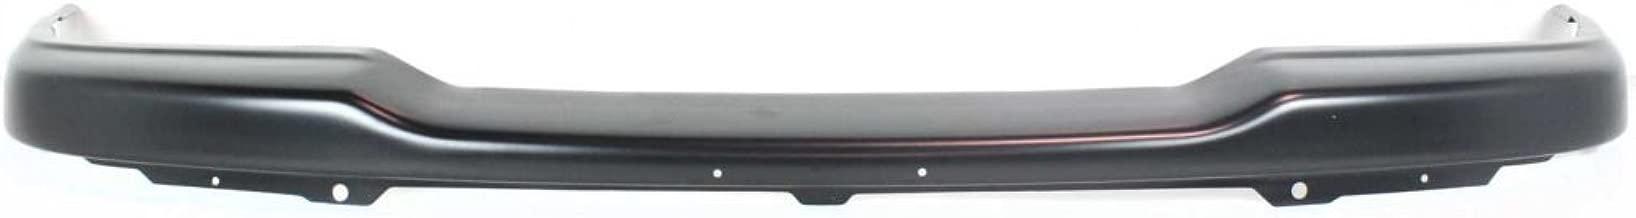 Bumper for Ford Ranger 01-05 Front Bumper Black Edge/Tremor Models